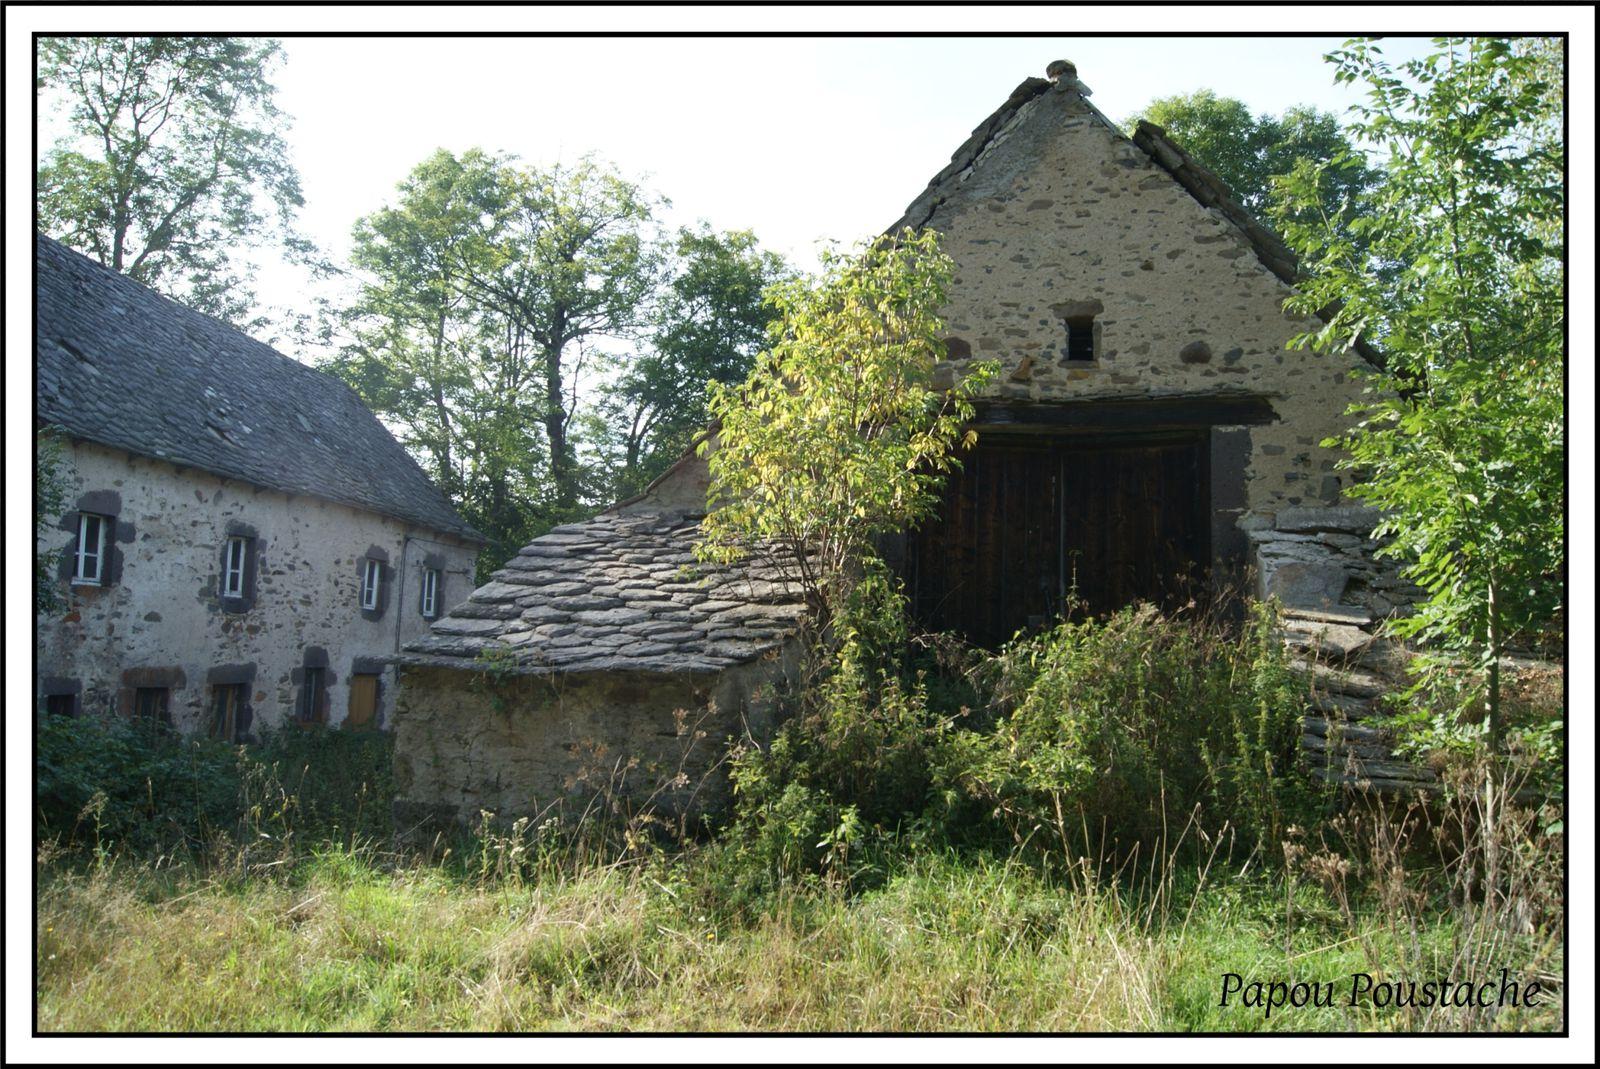 Le moulin de La Rochette